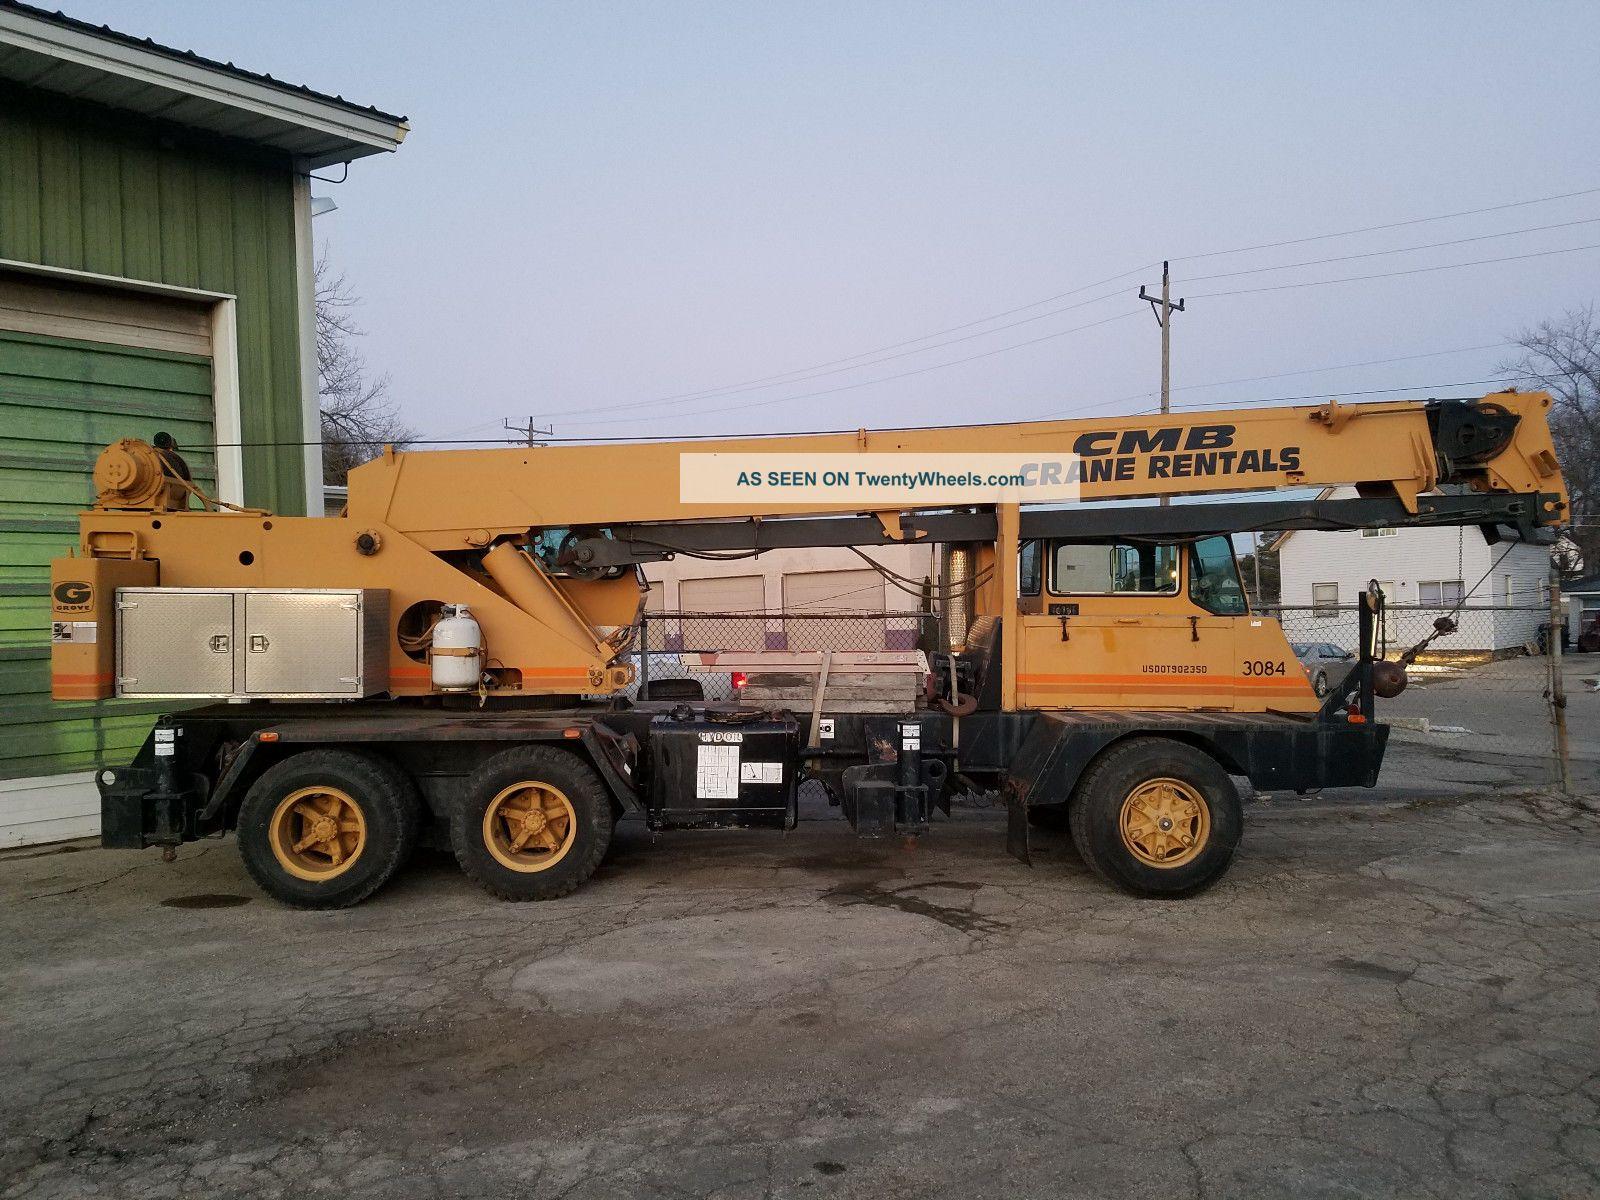 Grove Tms522 Truck Hydraulic Crane Cranes photo